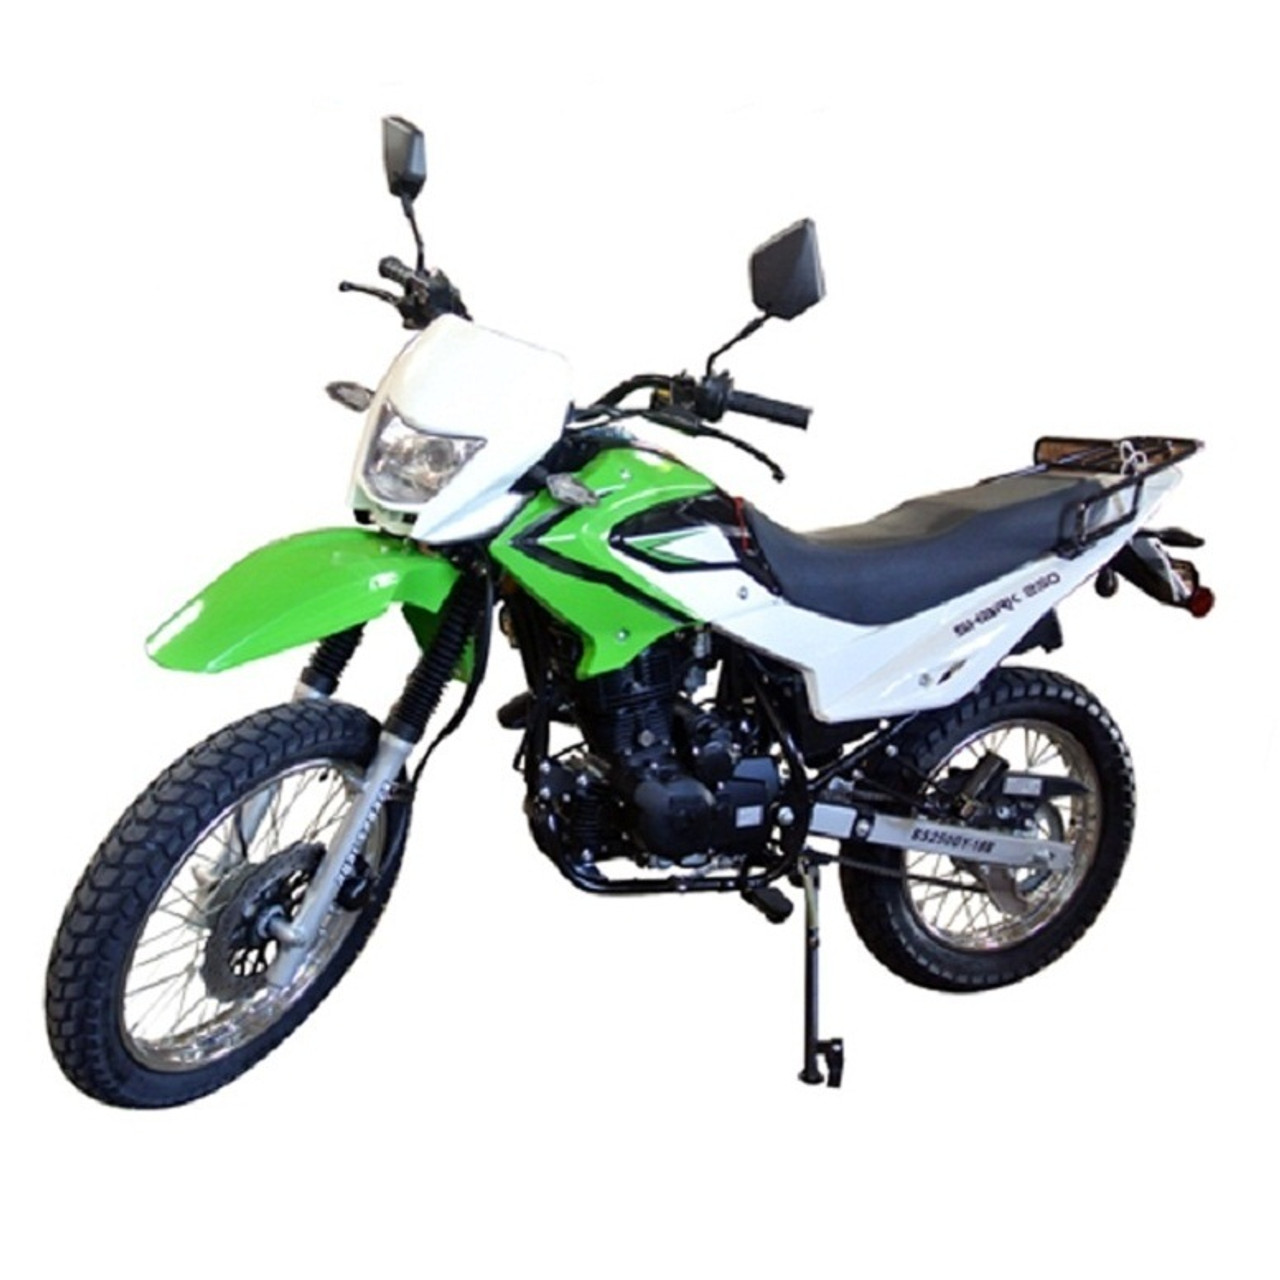 229cc Enduro Street Legal Dirt Bike 5 Speed Manual w/ Electric/Kick Start Air Cool Engine - Nduro Bike 18B